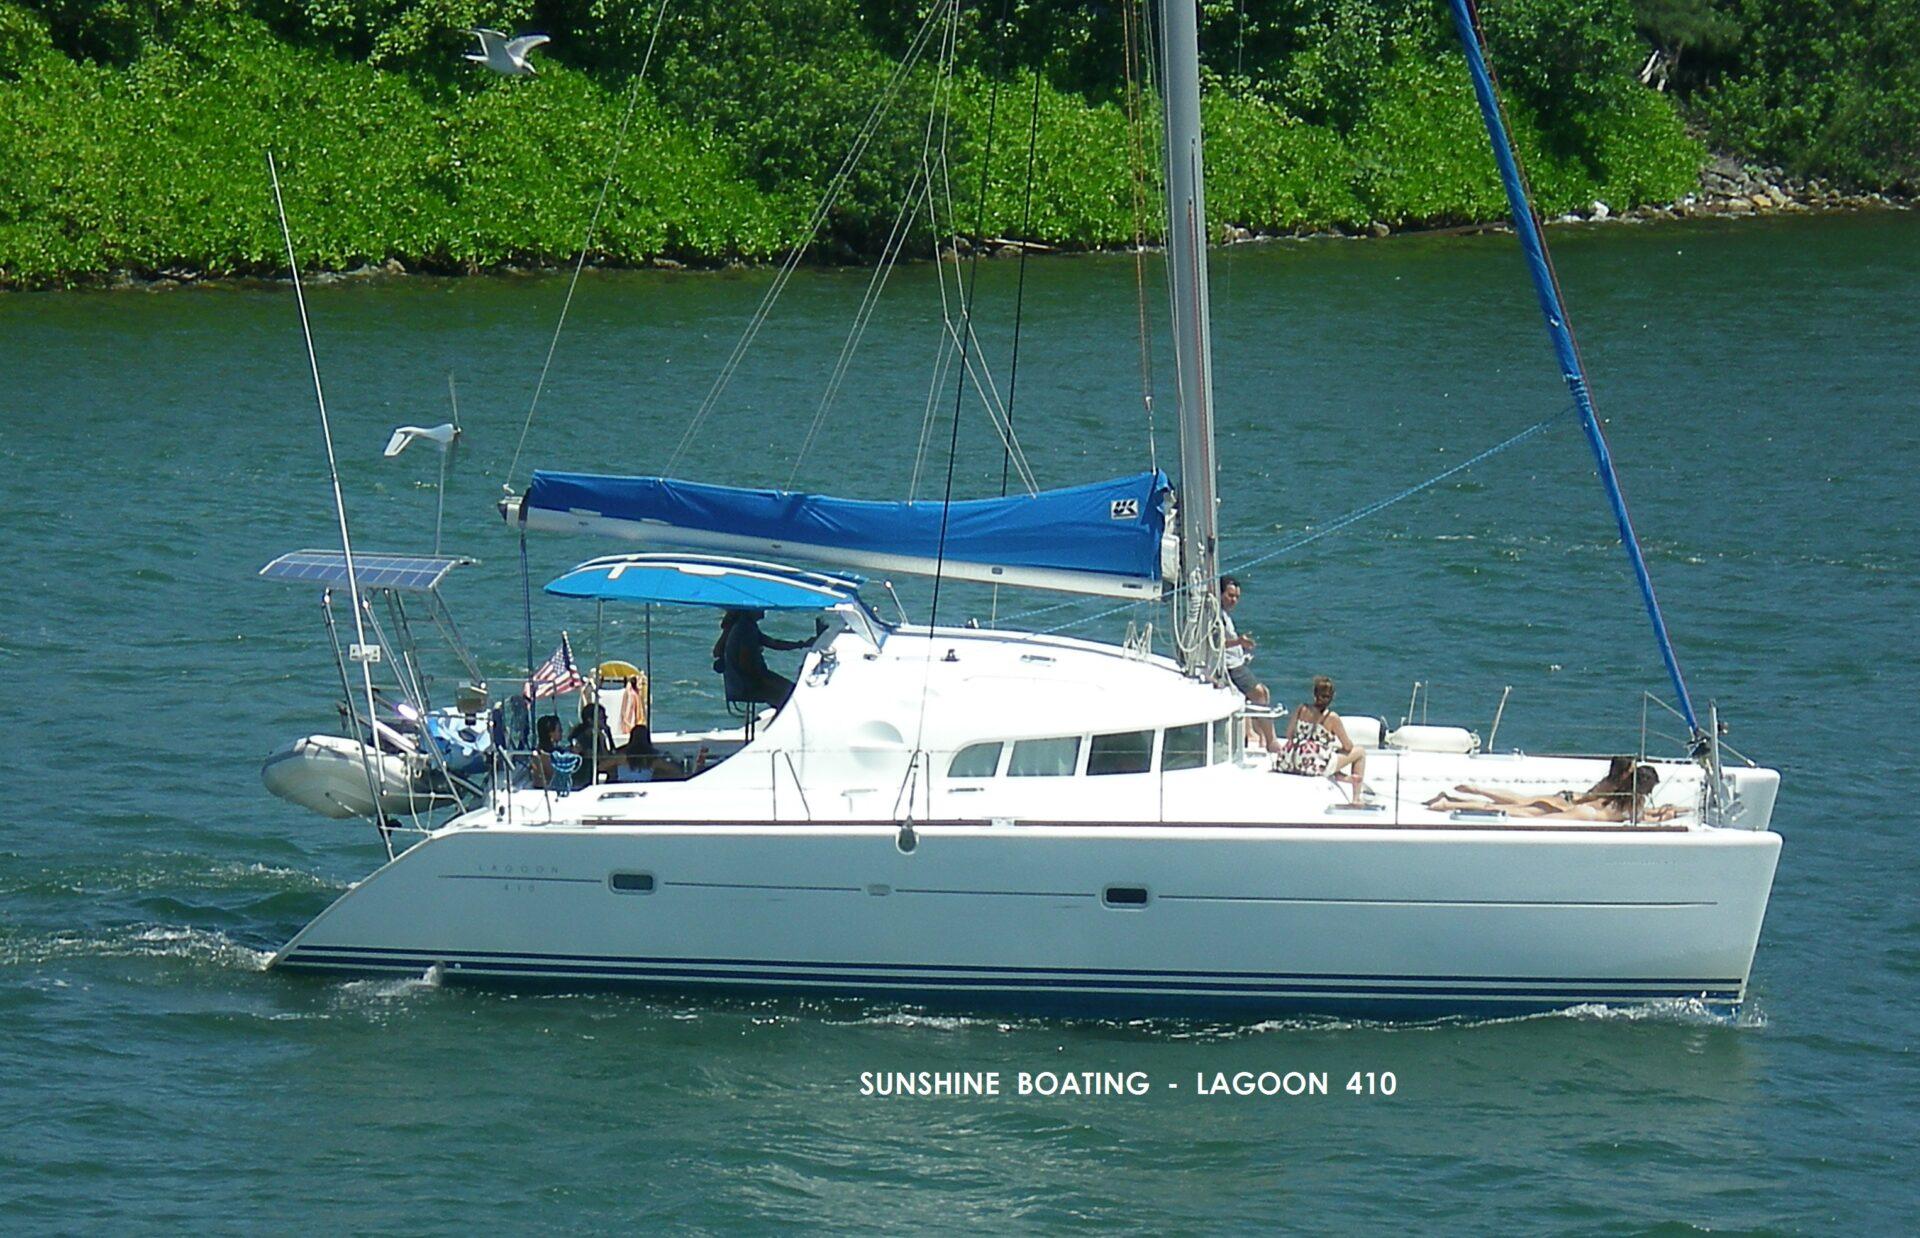 sunshine-boating-lagoon-41b